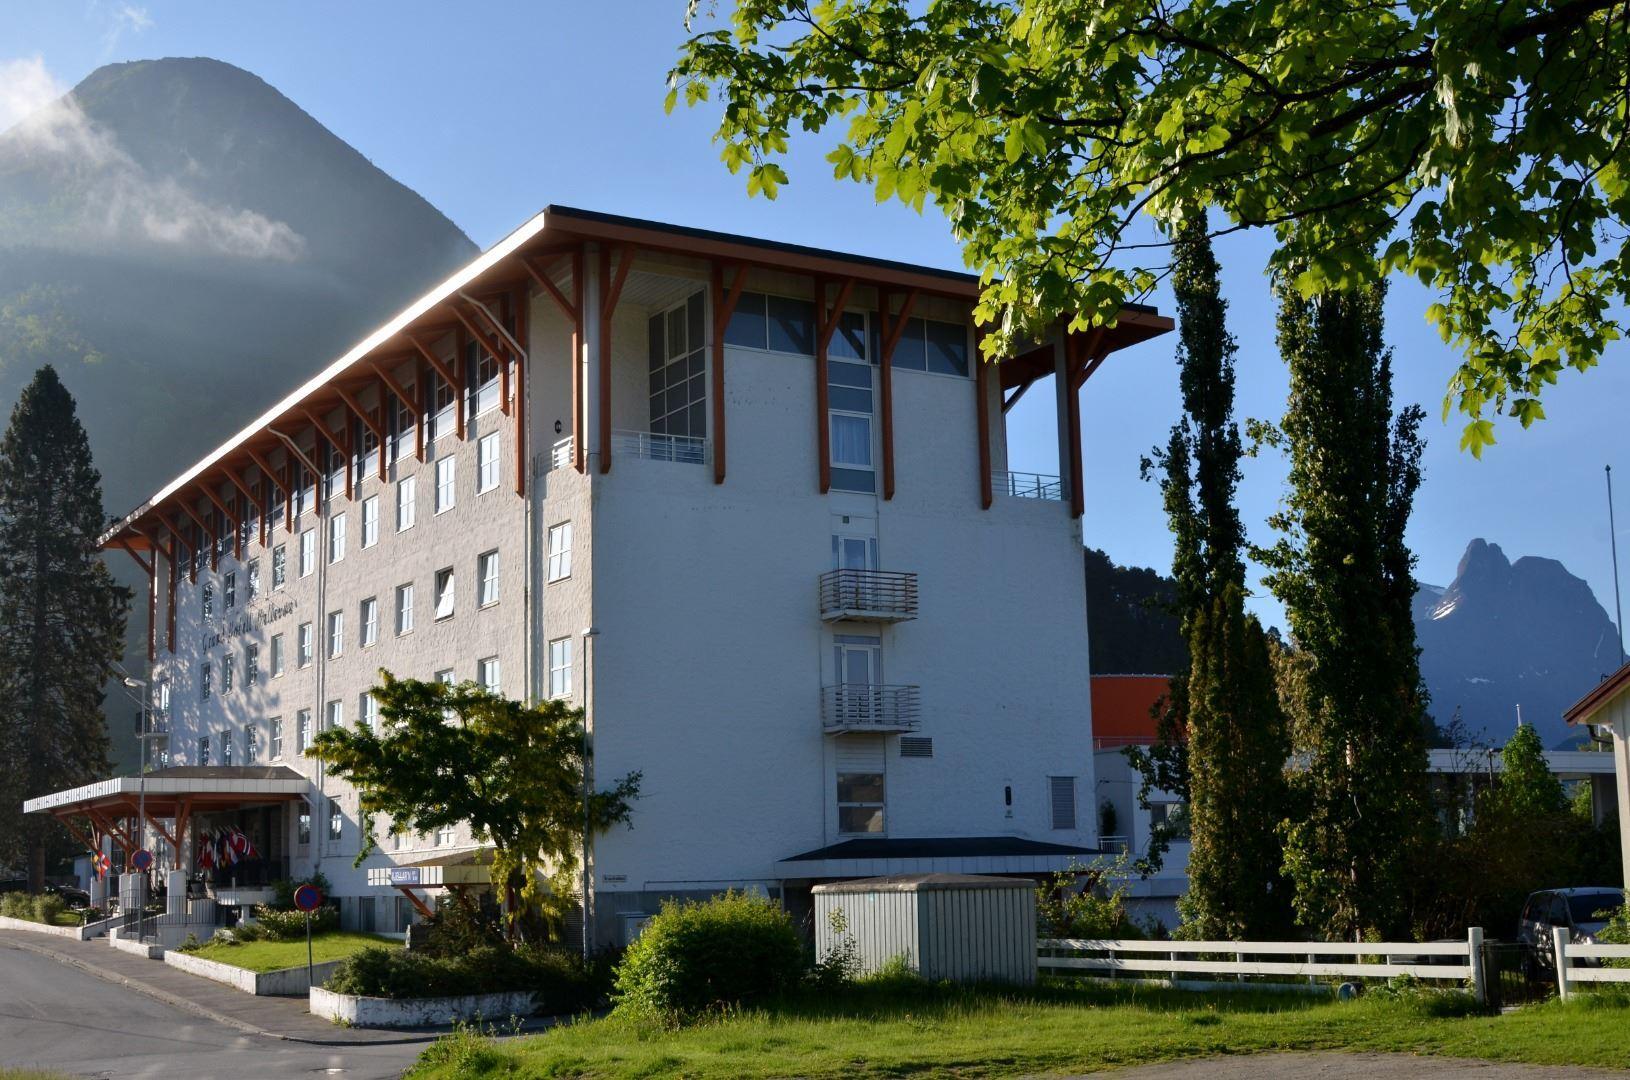 Grand Hotel i Romsdalen